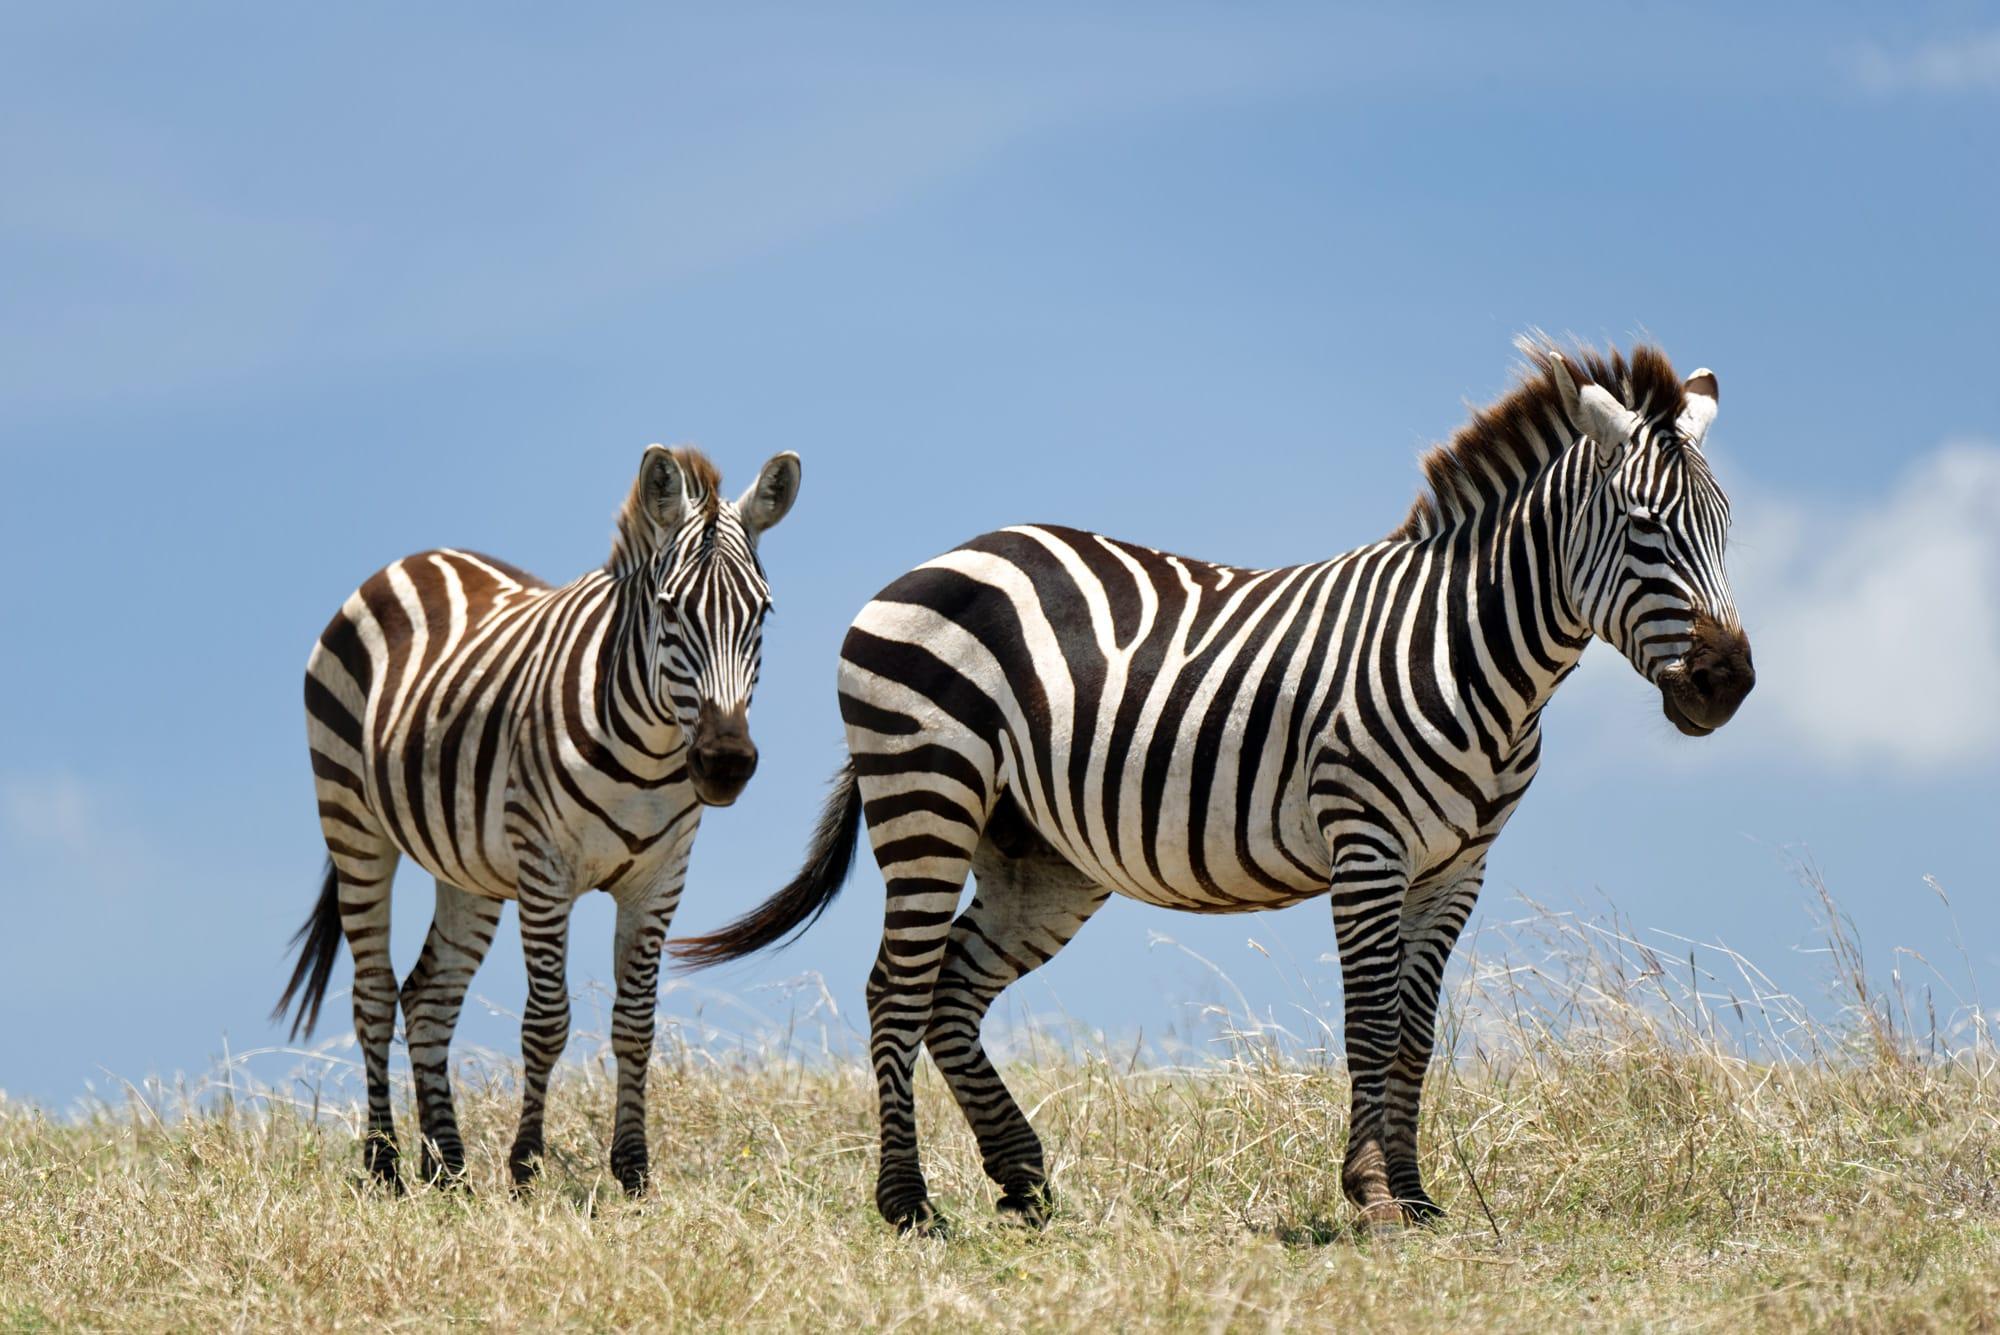 viajes-a-africa-tanzania-safari-a-medida